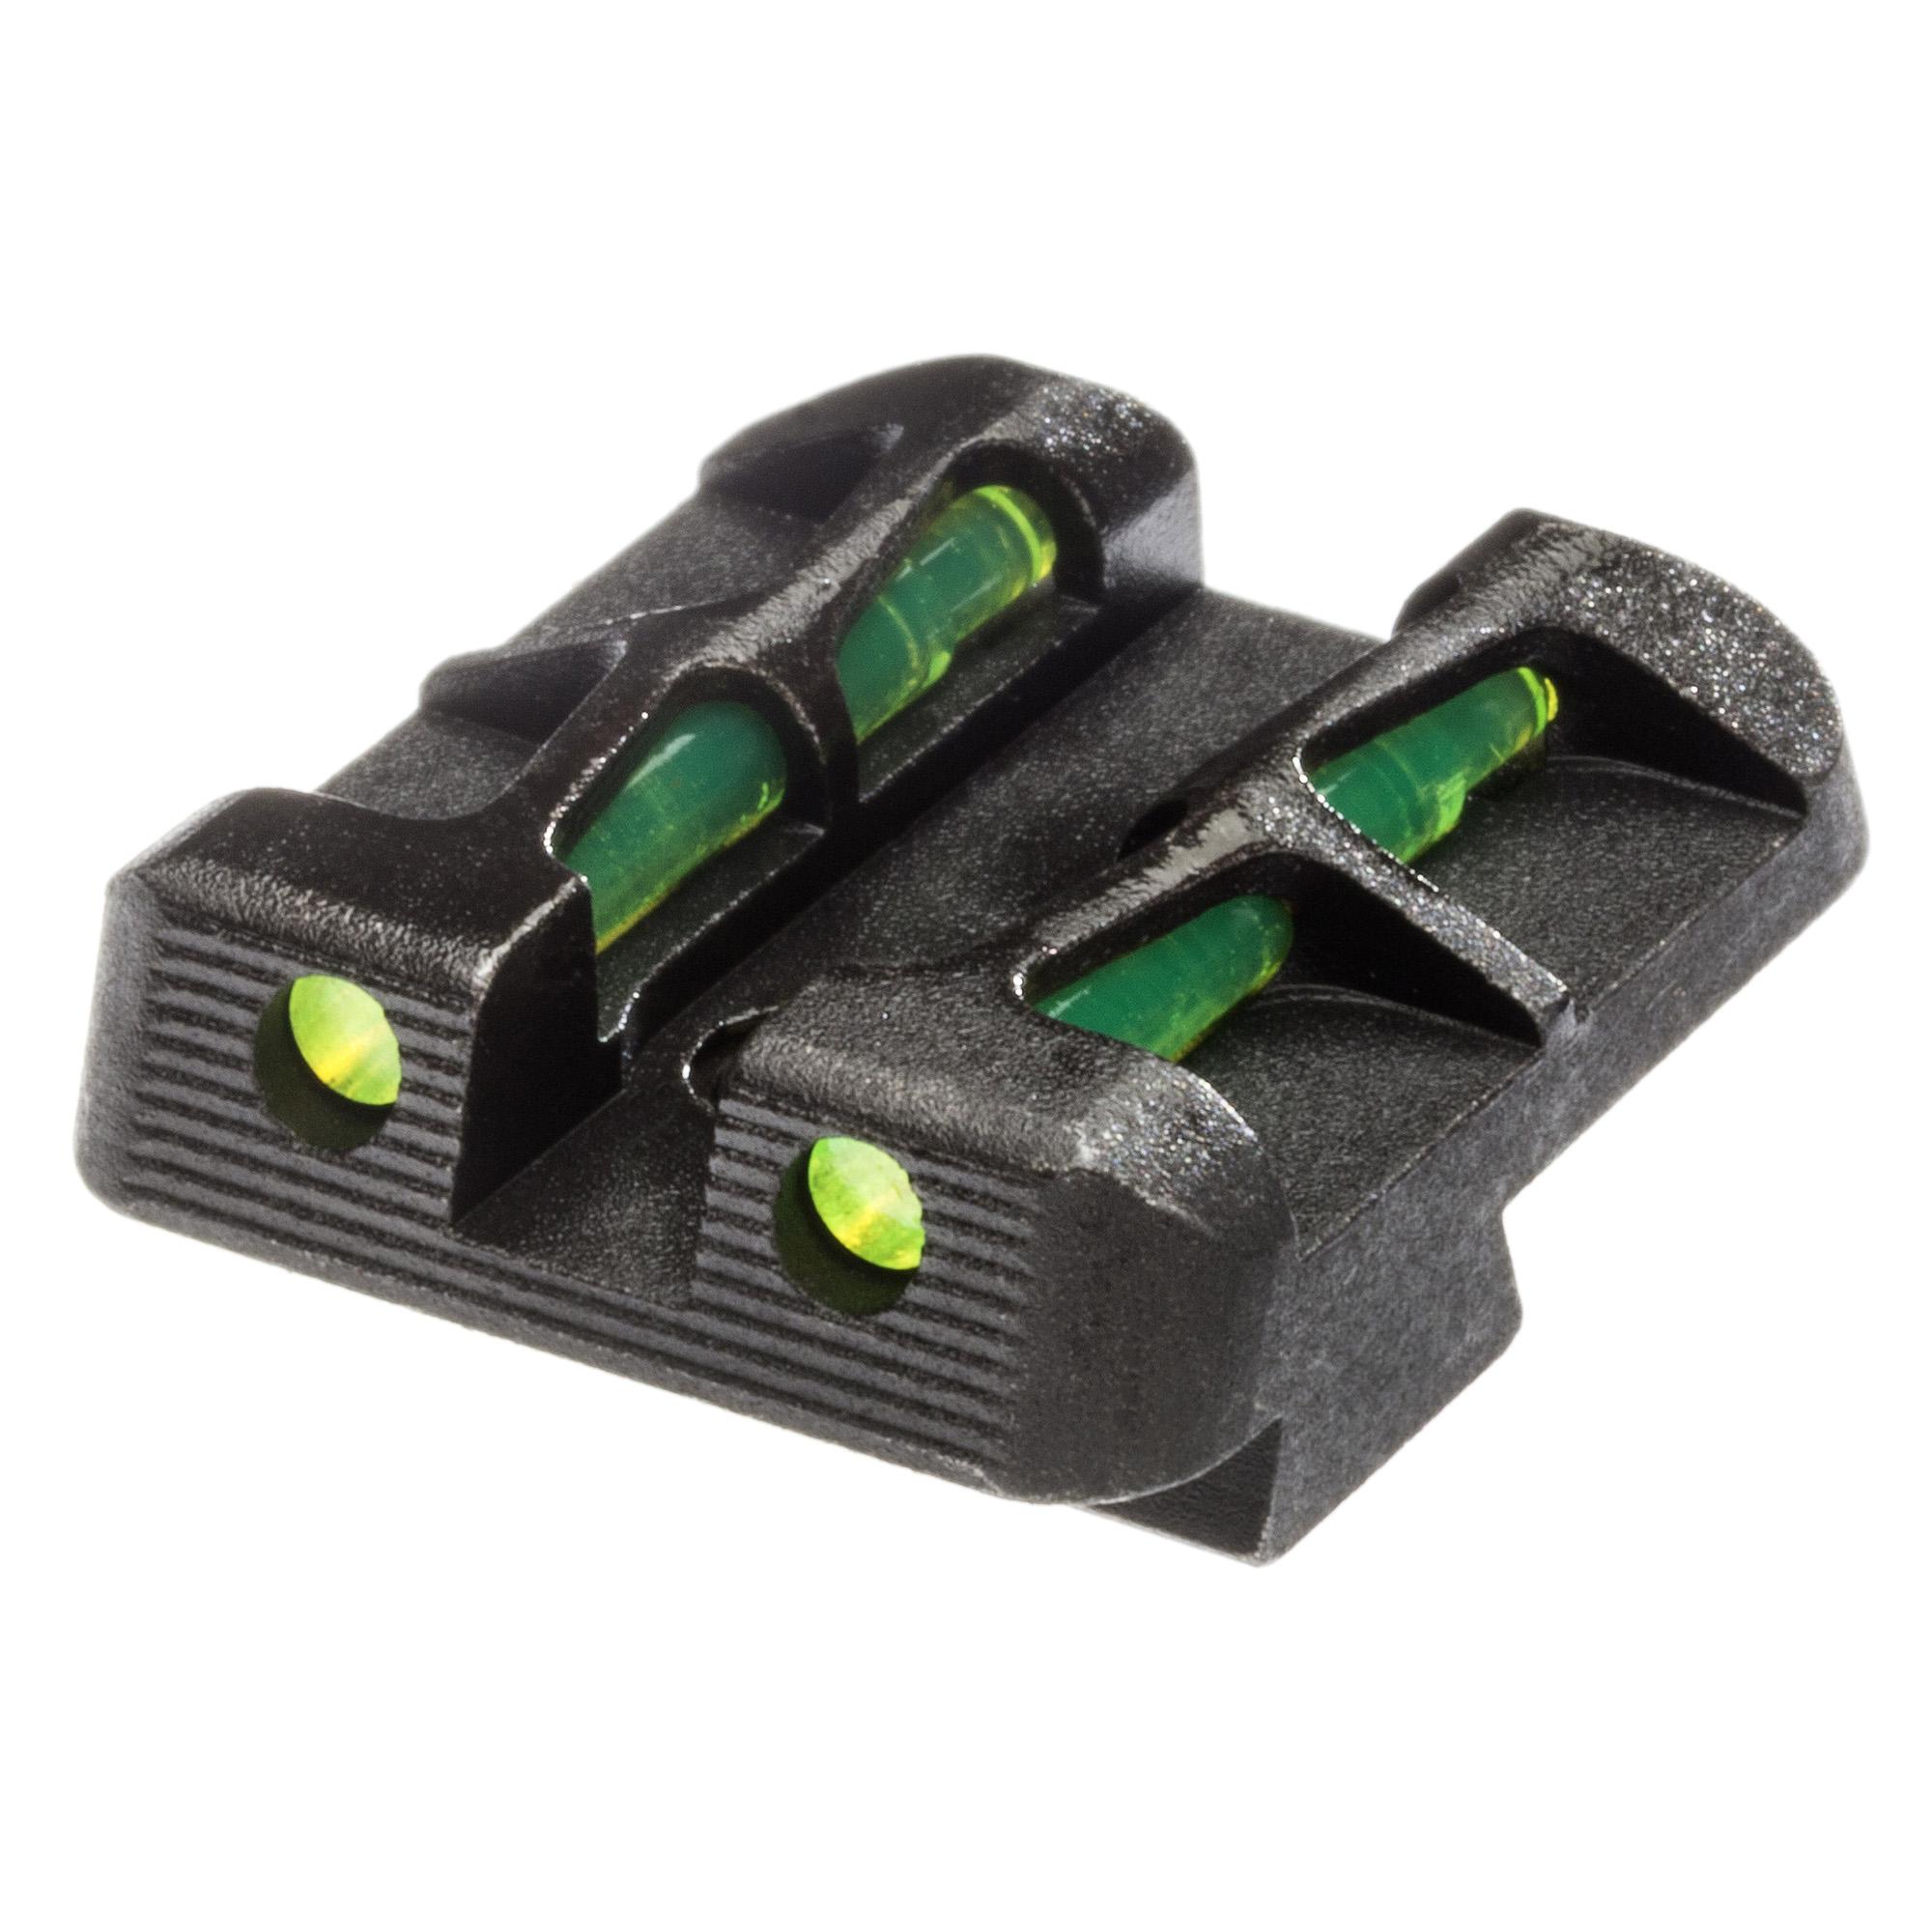 Hiviz For Glk Interchange Sght 6.5mm